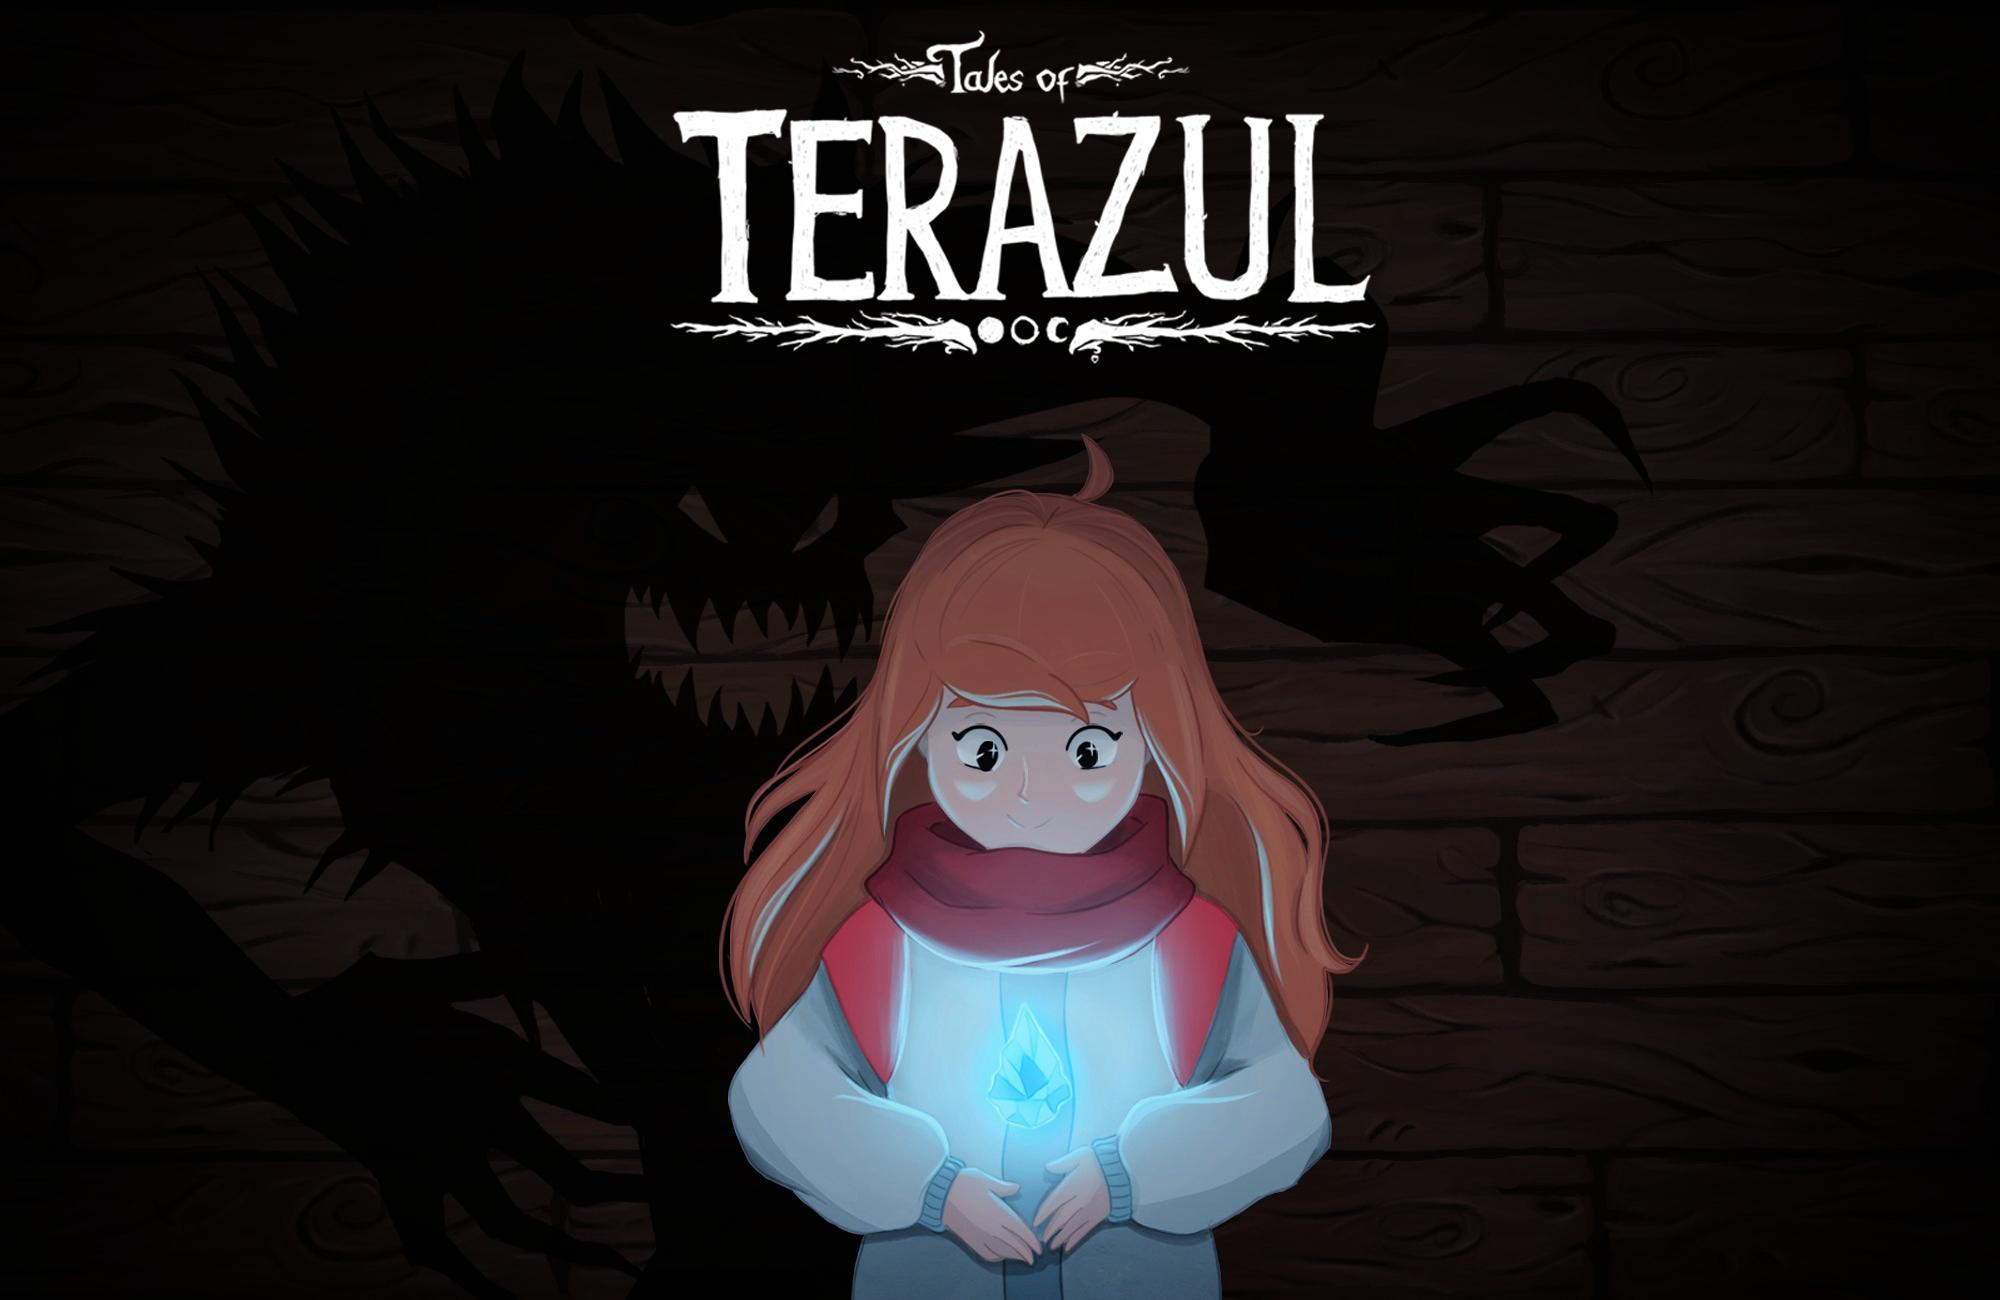 Tales of Terazul